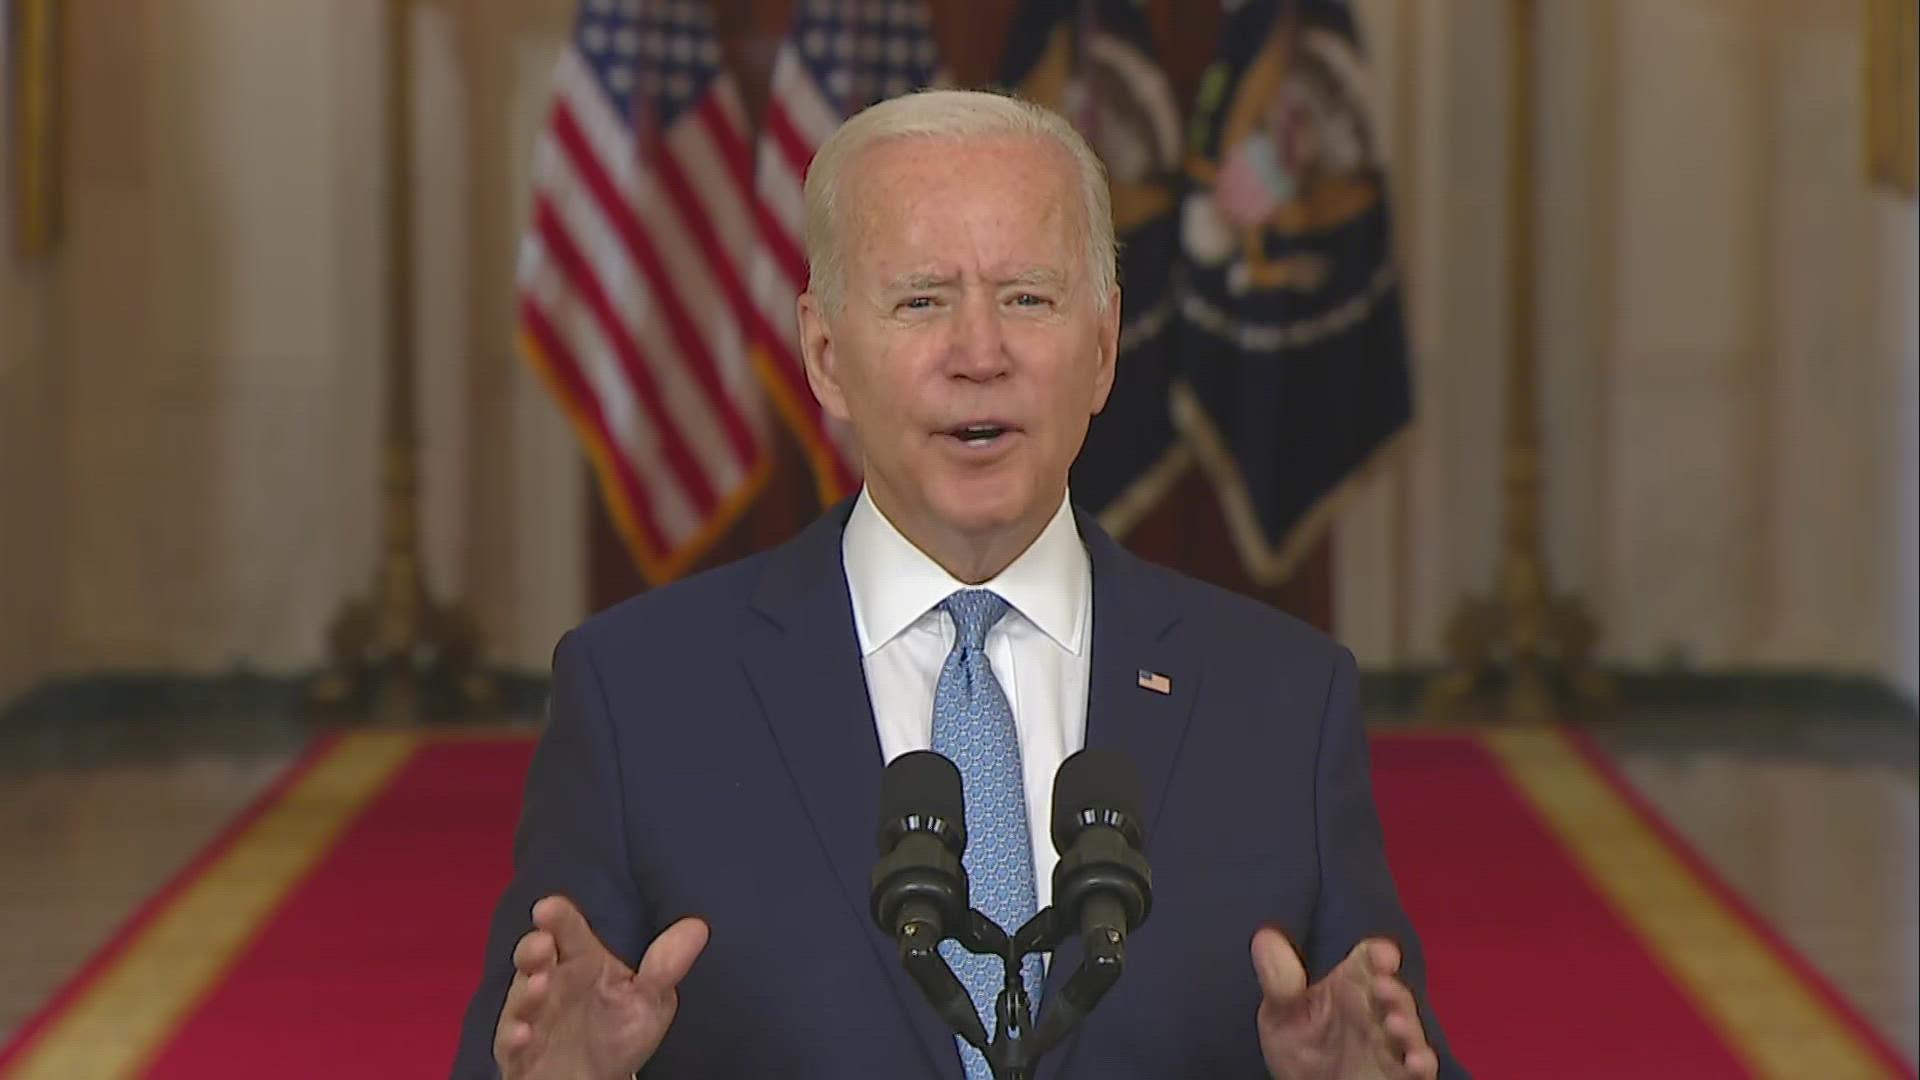 Rick Roberts: Who is Biden's Puppet Master?